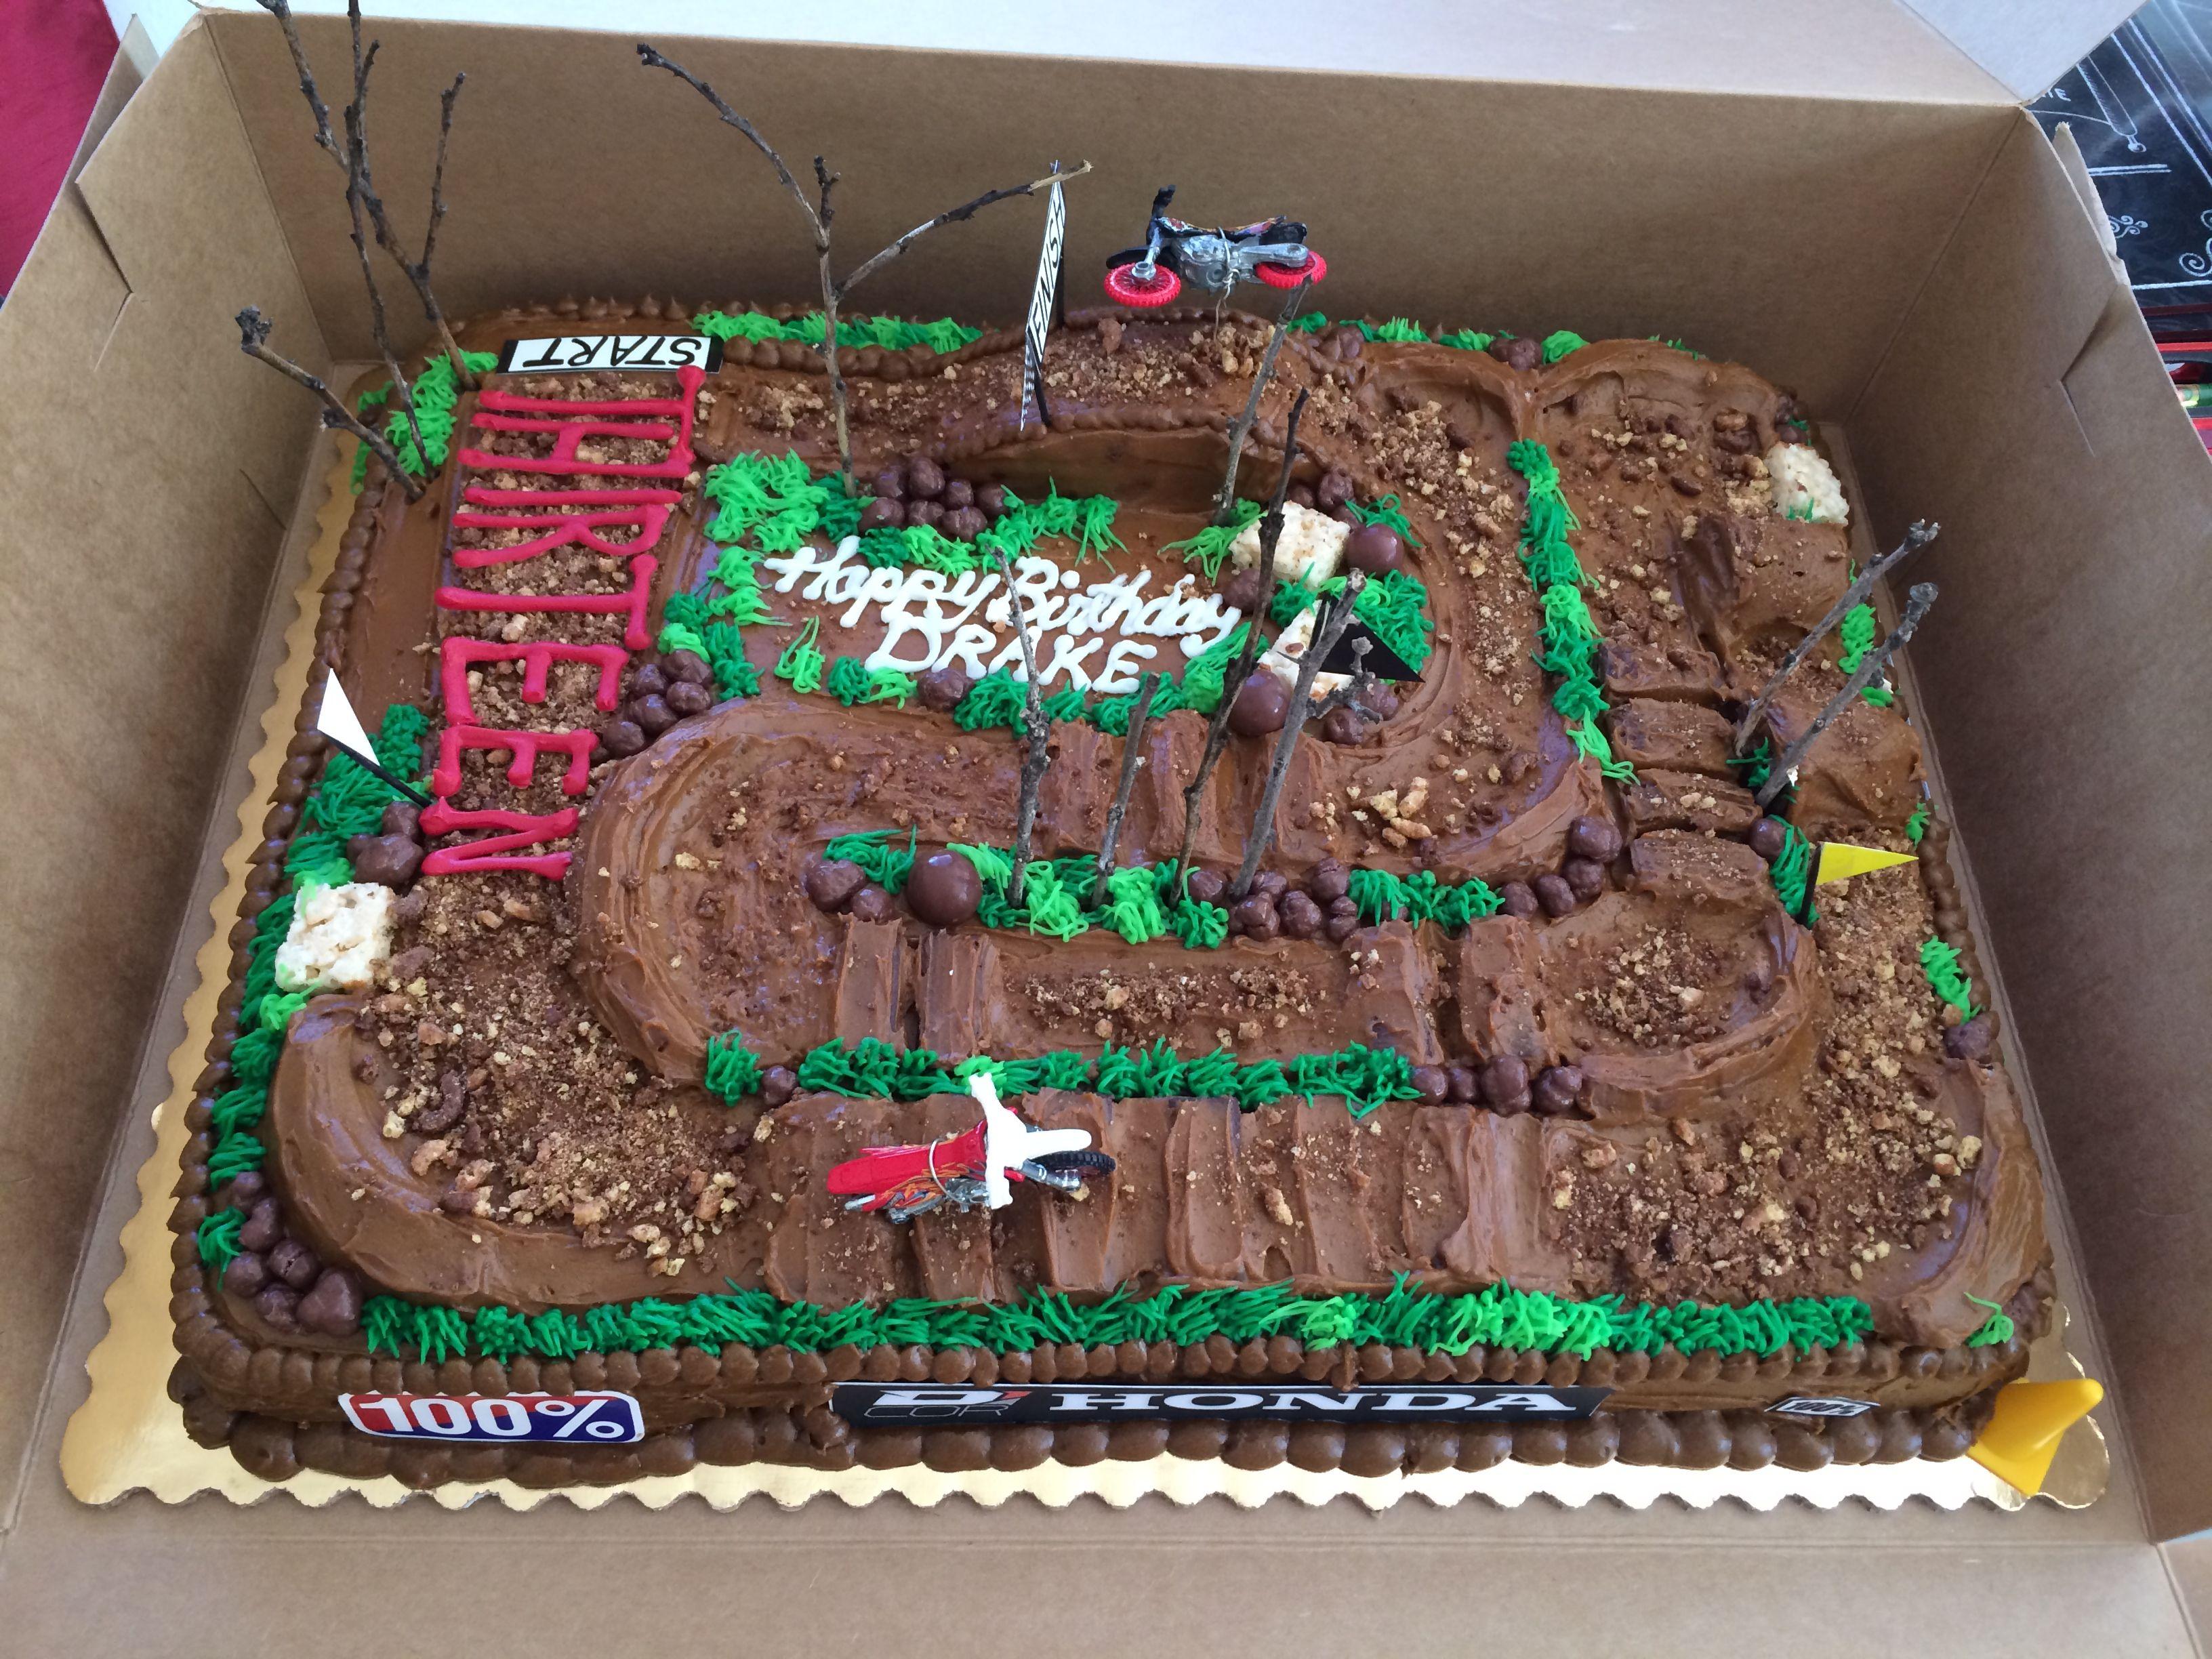 Outdoor Motorcross Track Cake Visit Https Store